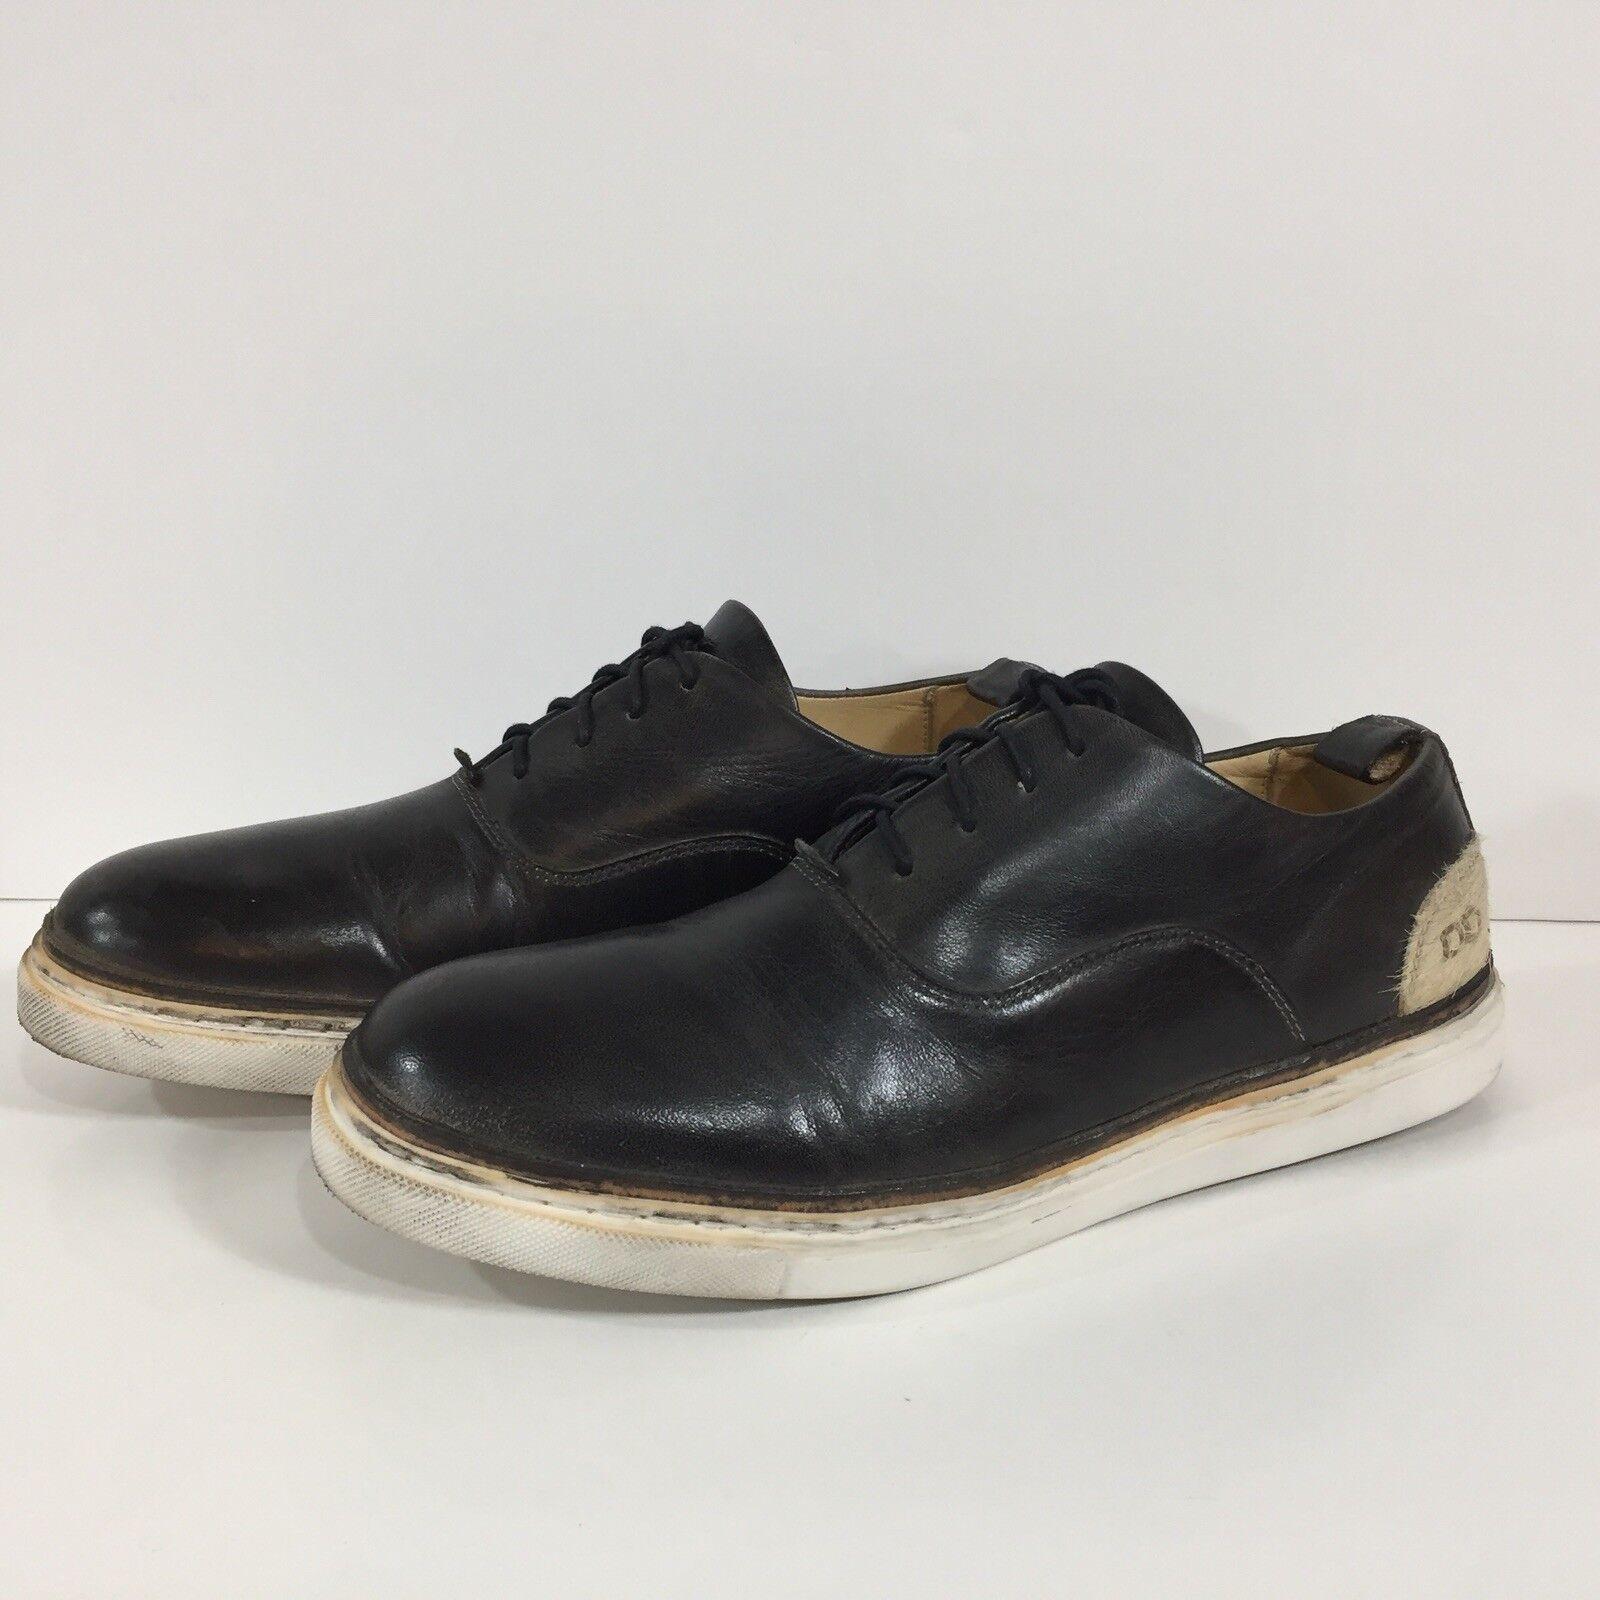 Bed Stu Mens Leather Sneaker Bishop Black Rustic Size 10.5 M